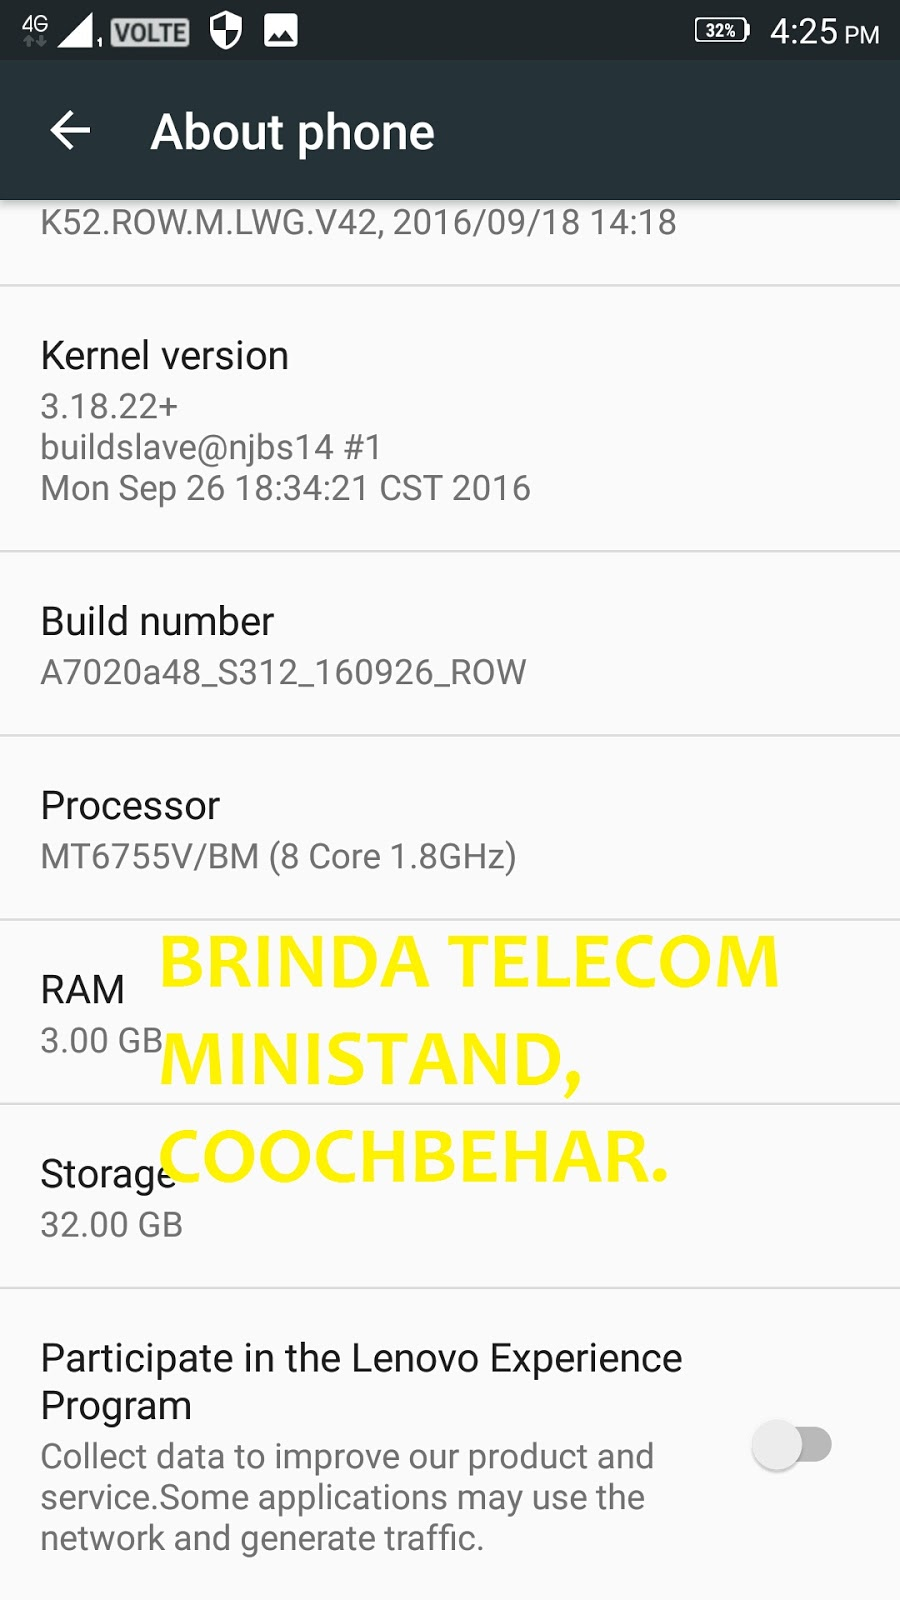 BRINDA TELECOM: LENOVO A7020a48 VIVE K5 NOTE FLASH FILE 32GB RAM